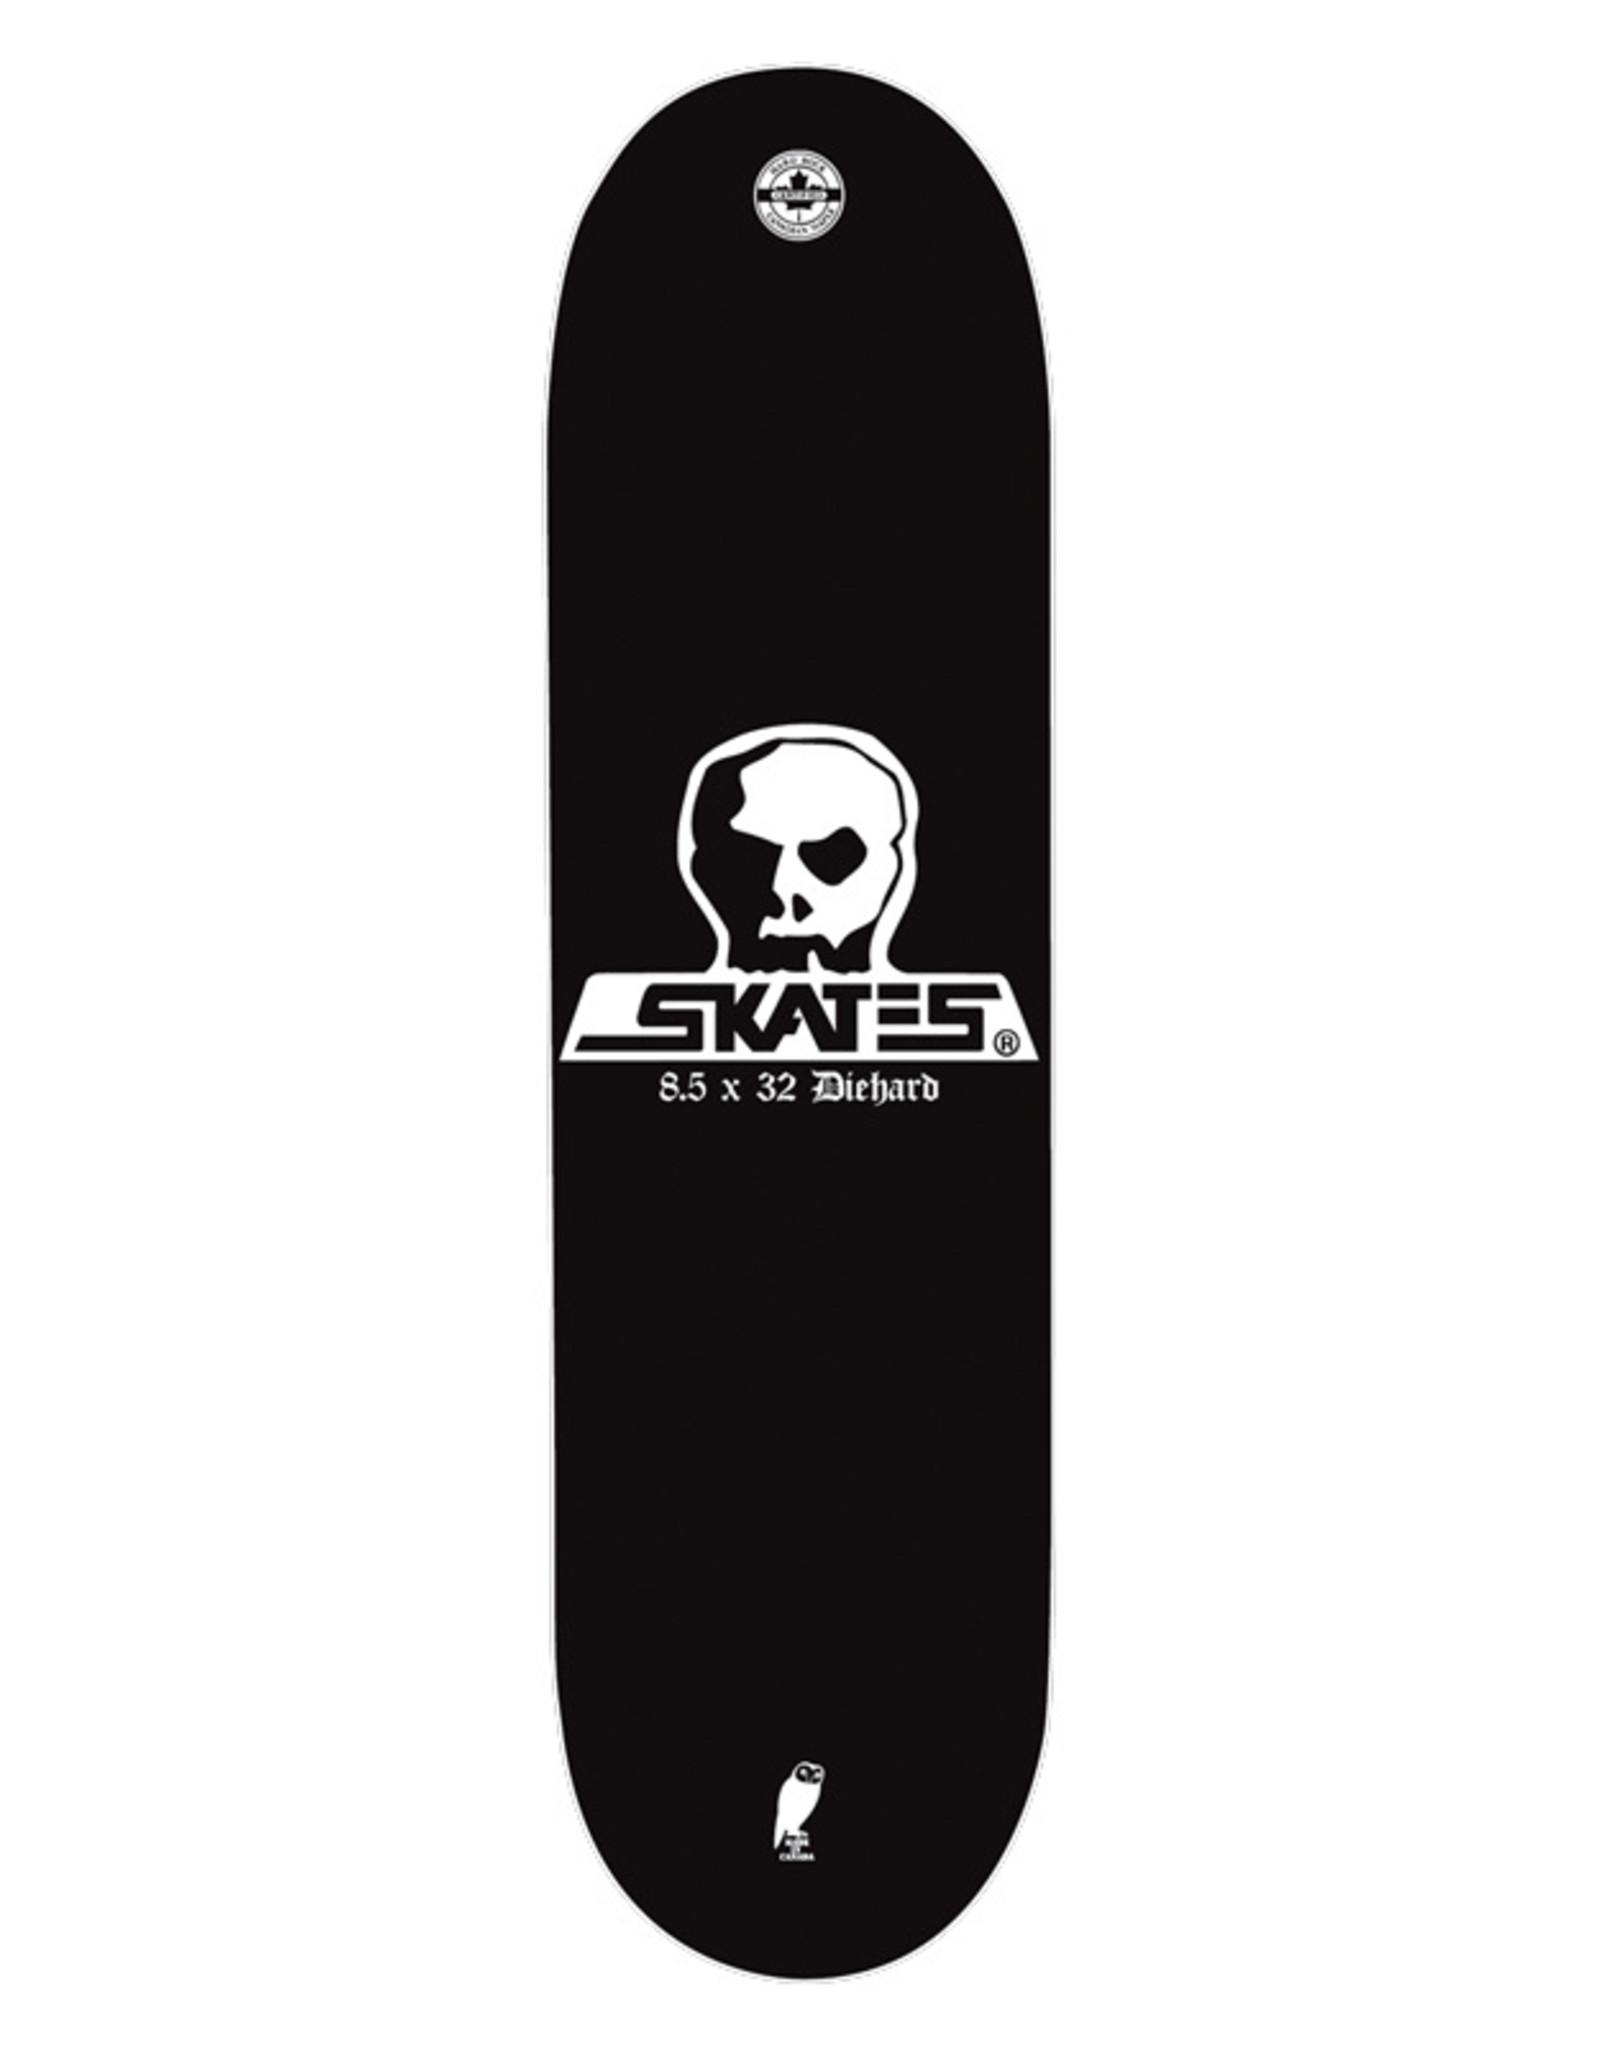 Skull Skates SKULL DECK DIEHARD 8.5x32